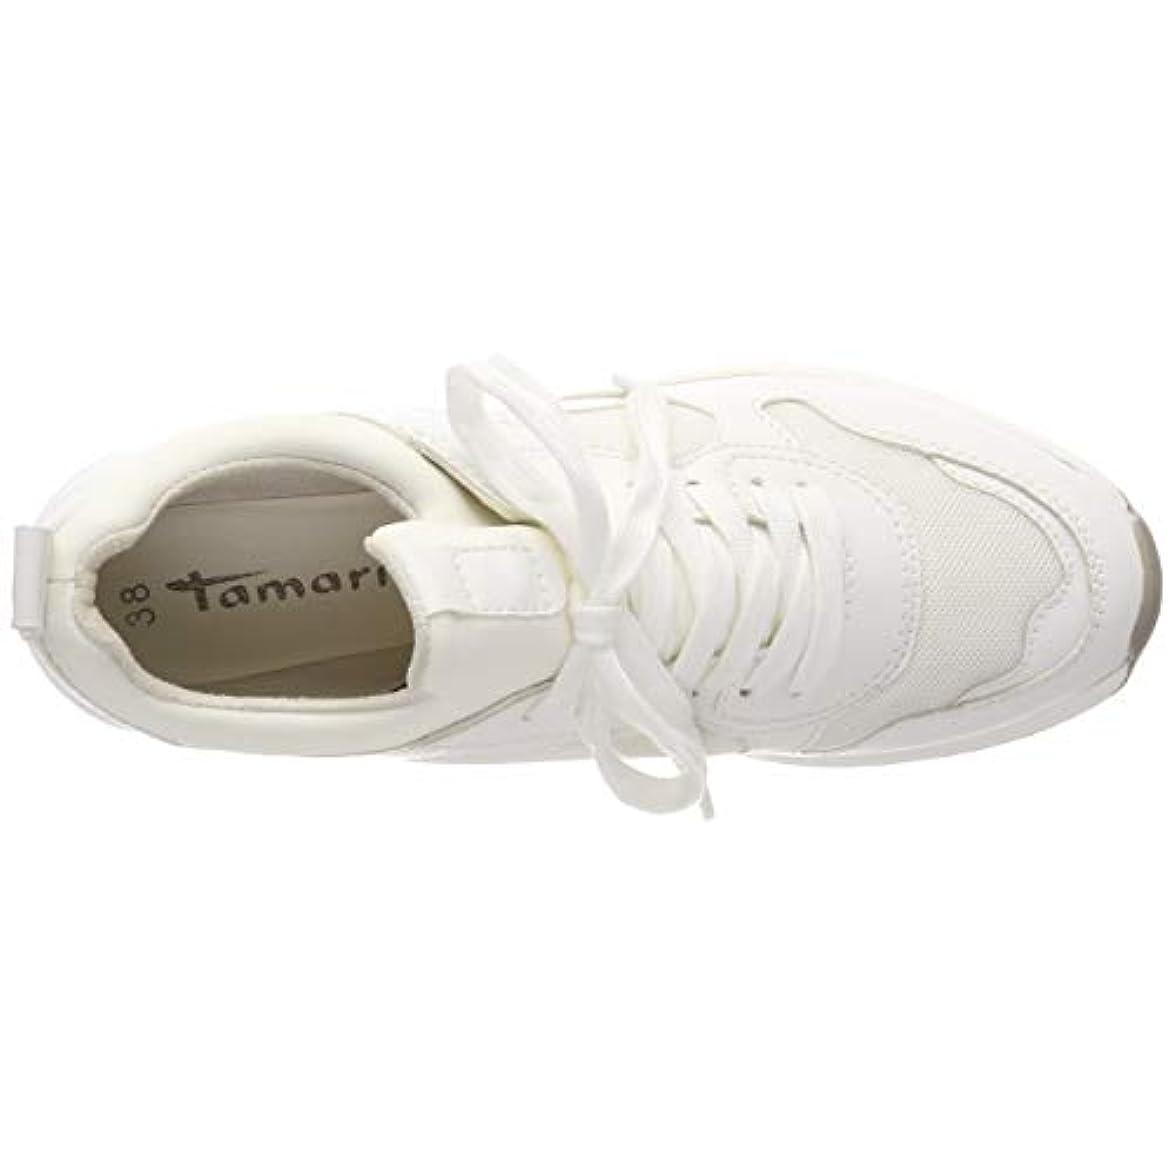 Tamaris 1-1-23728-22 100 Scarpe Da Ginnastica Basse Donna